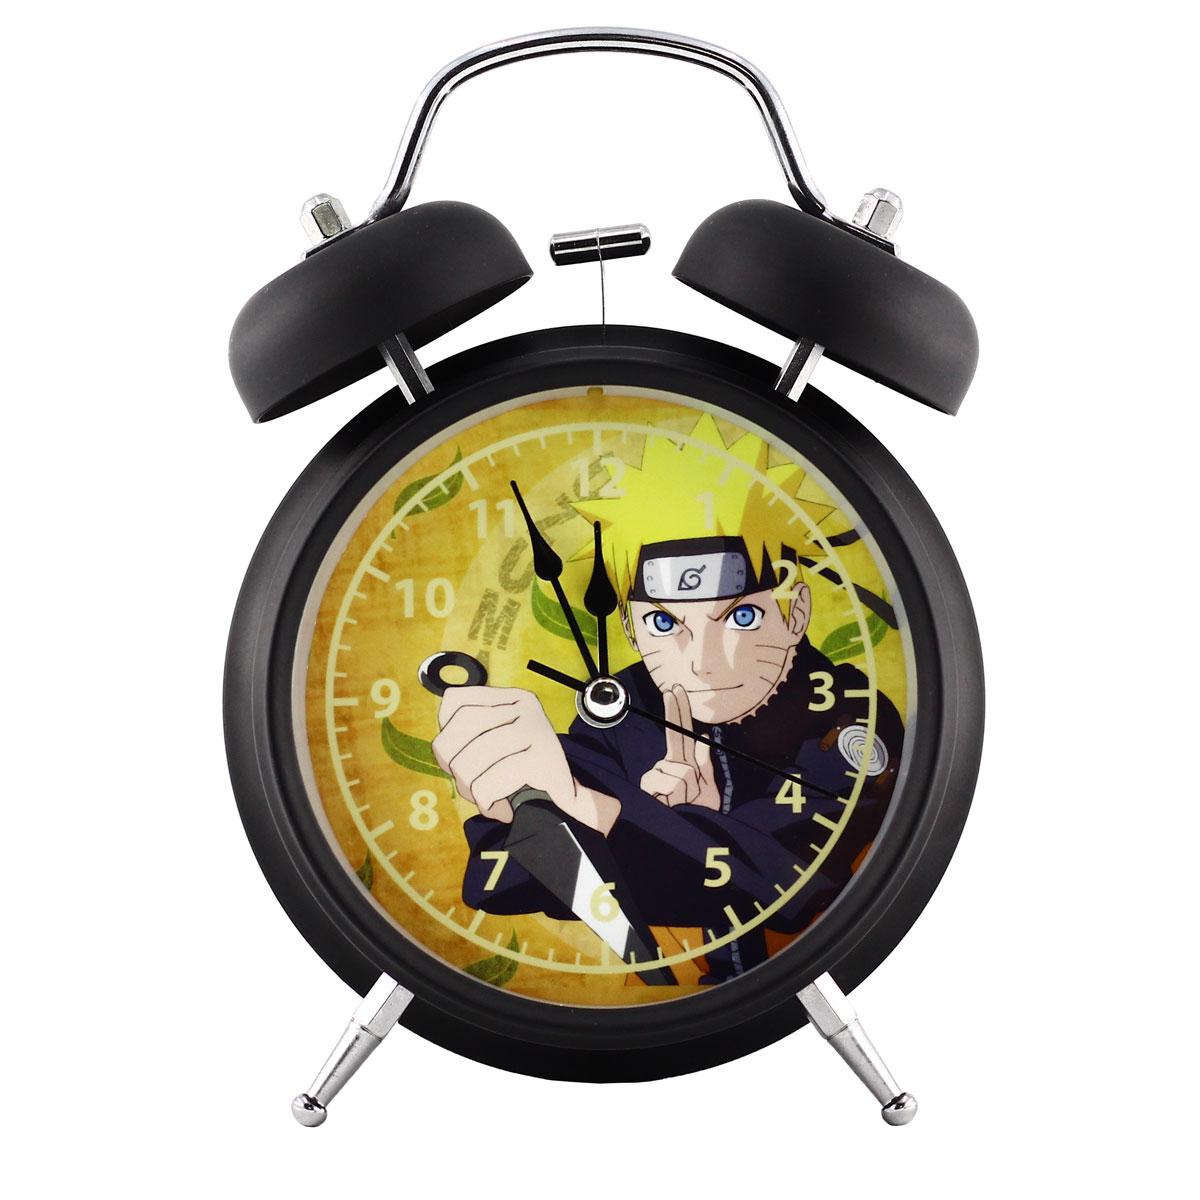 ساعت رومیزی کودک طرح انیمه ناروتو کد 2003